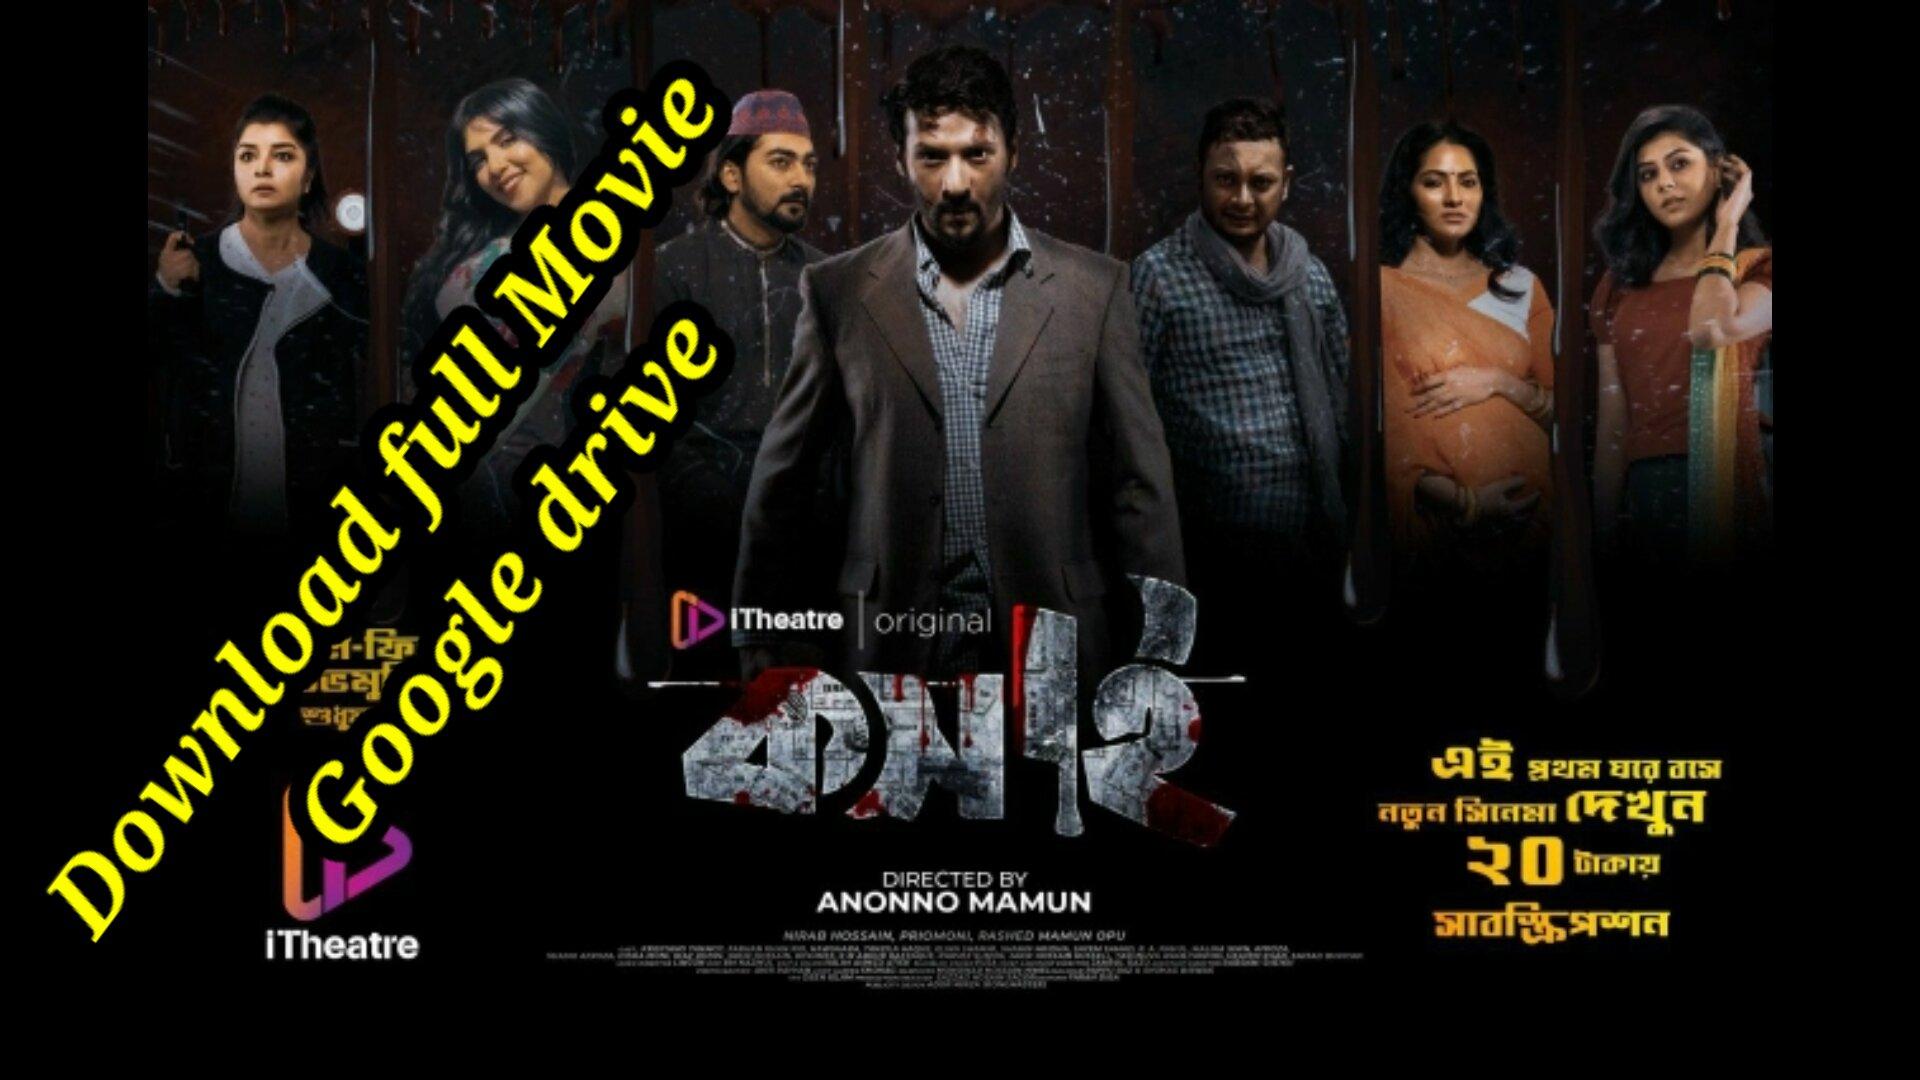 Koshai (2021) itheatre full movie bangla download